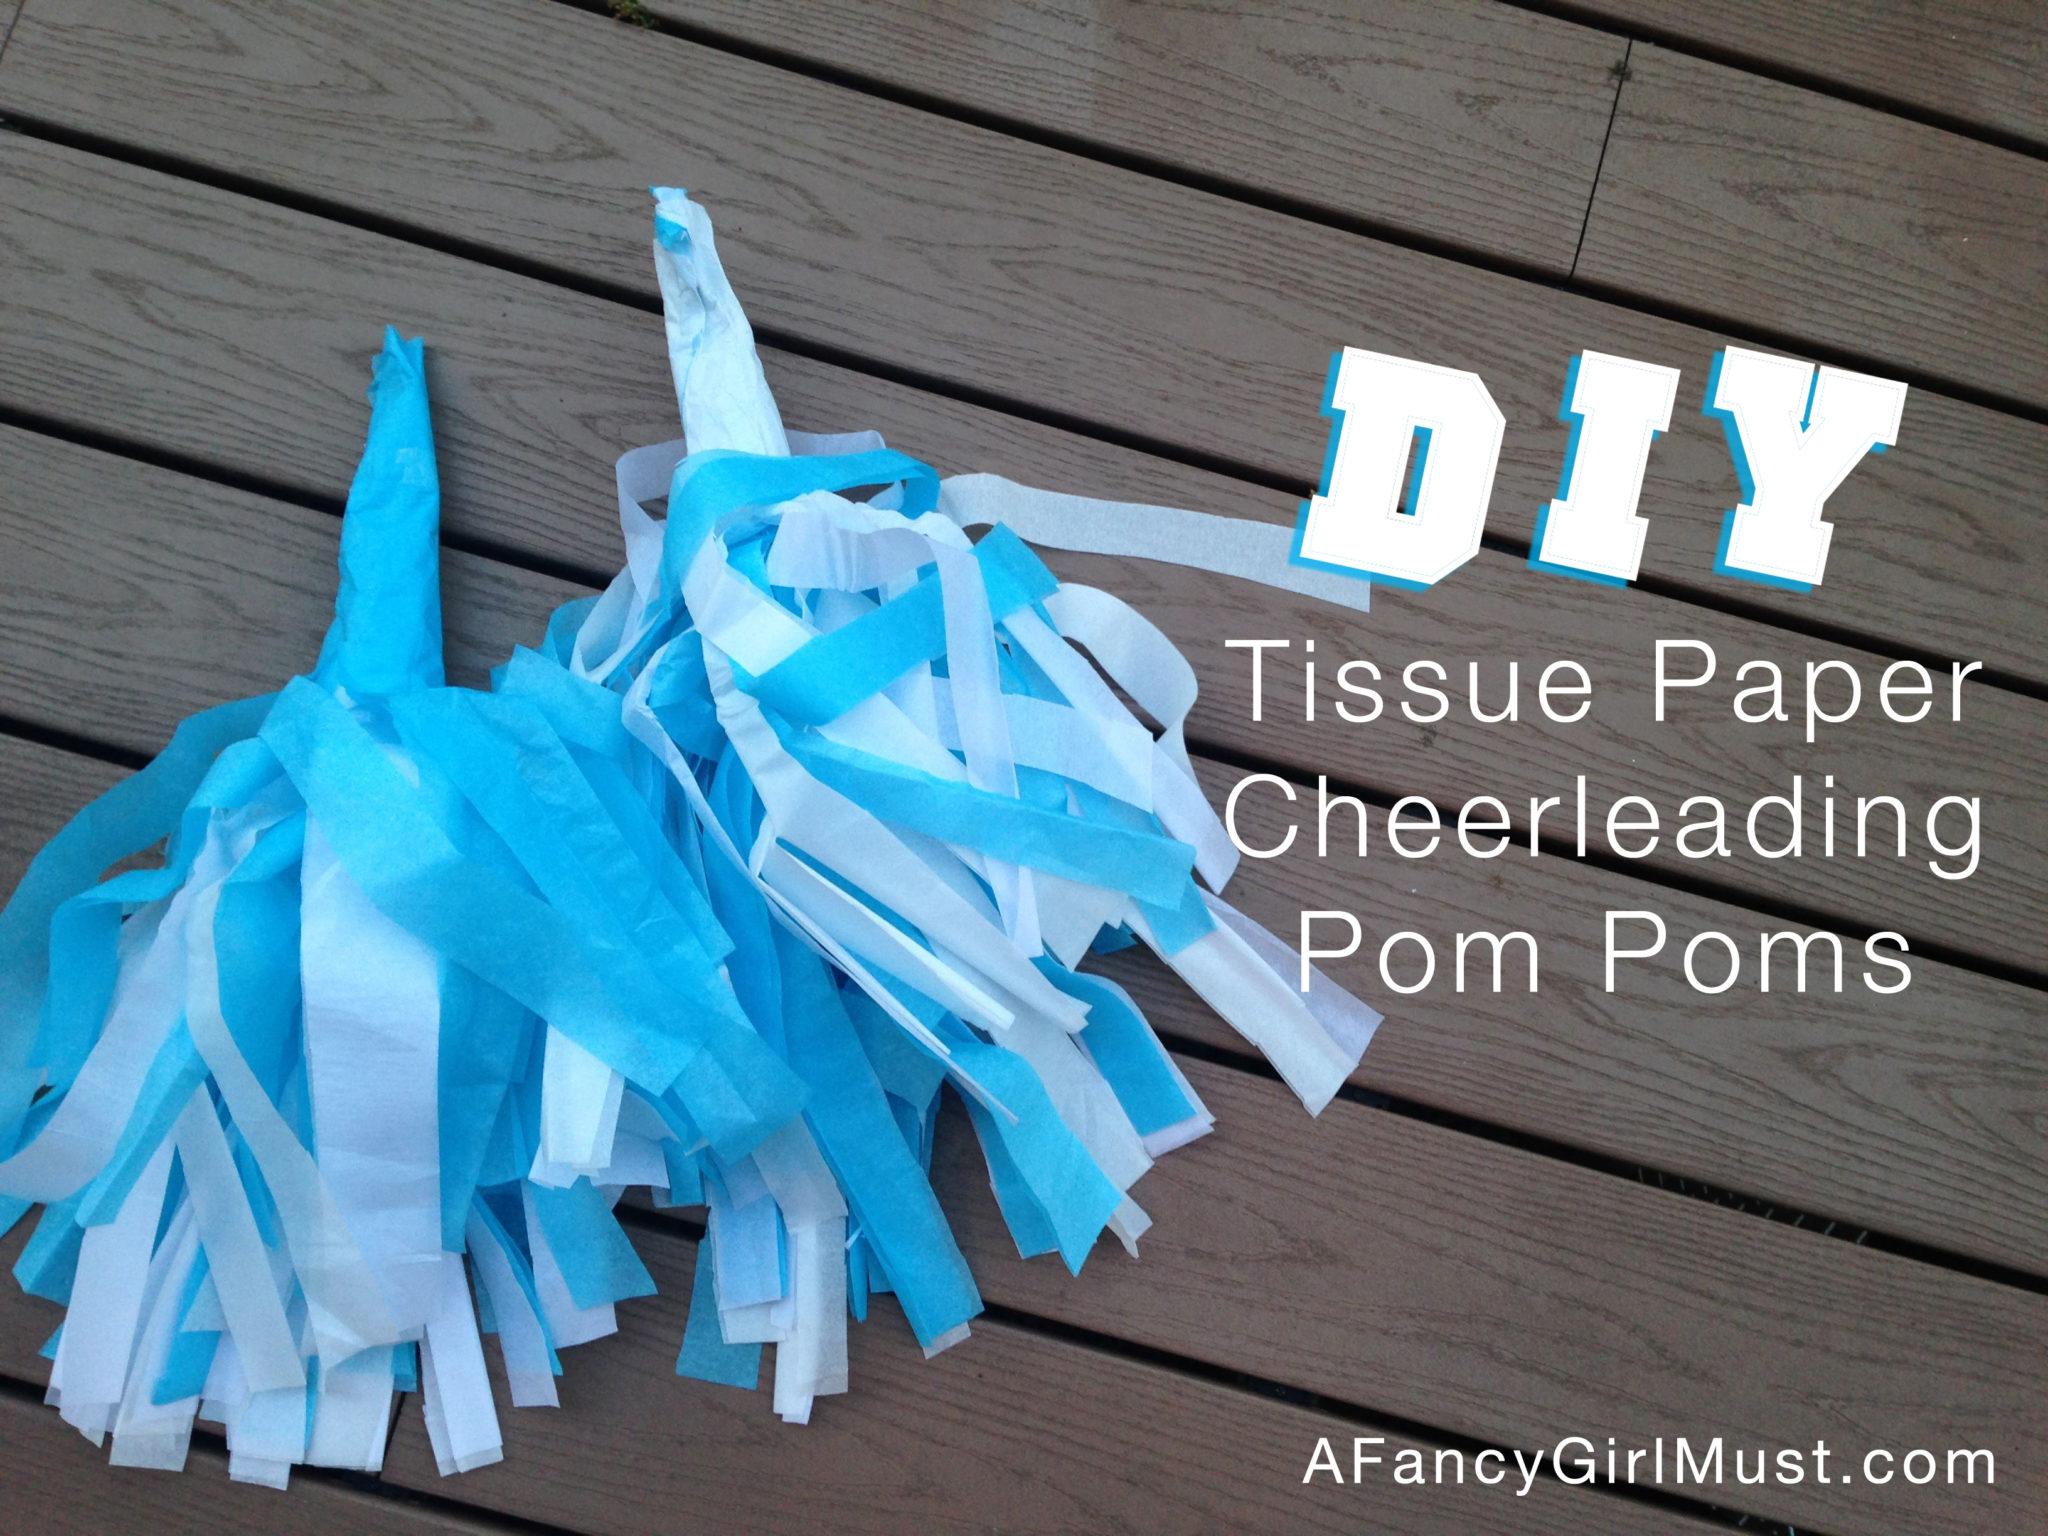 diy tissue paper cheerleading pom poms. Black Bedroom Furniture Sets. Home Design Ideas